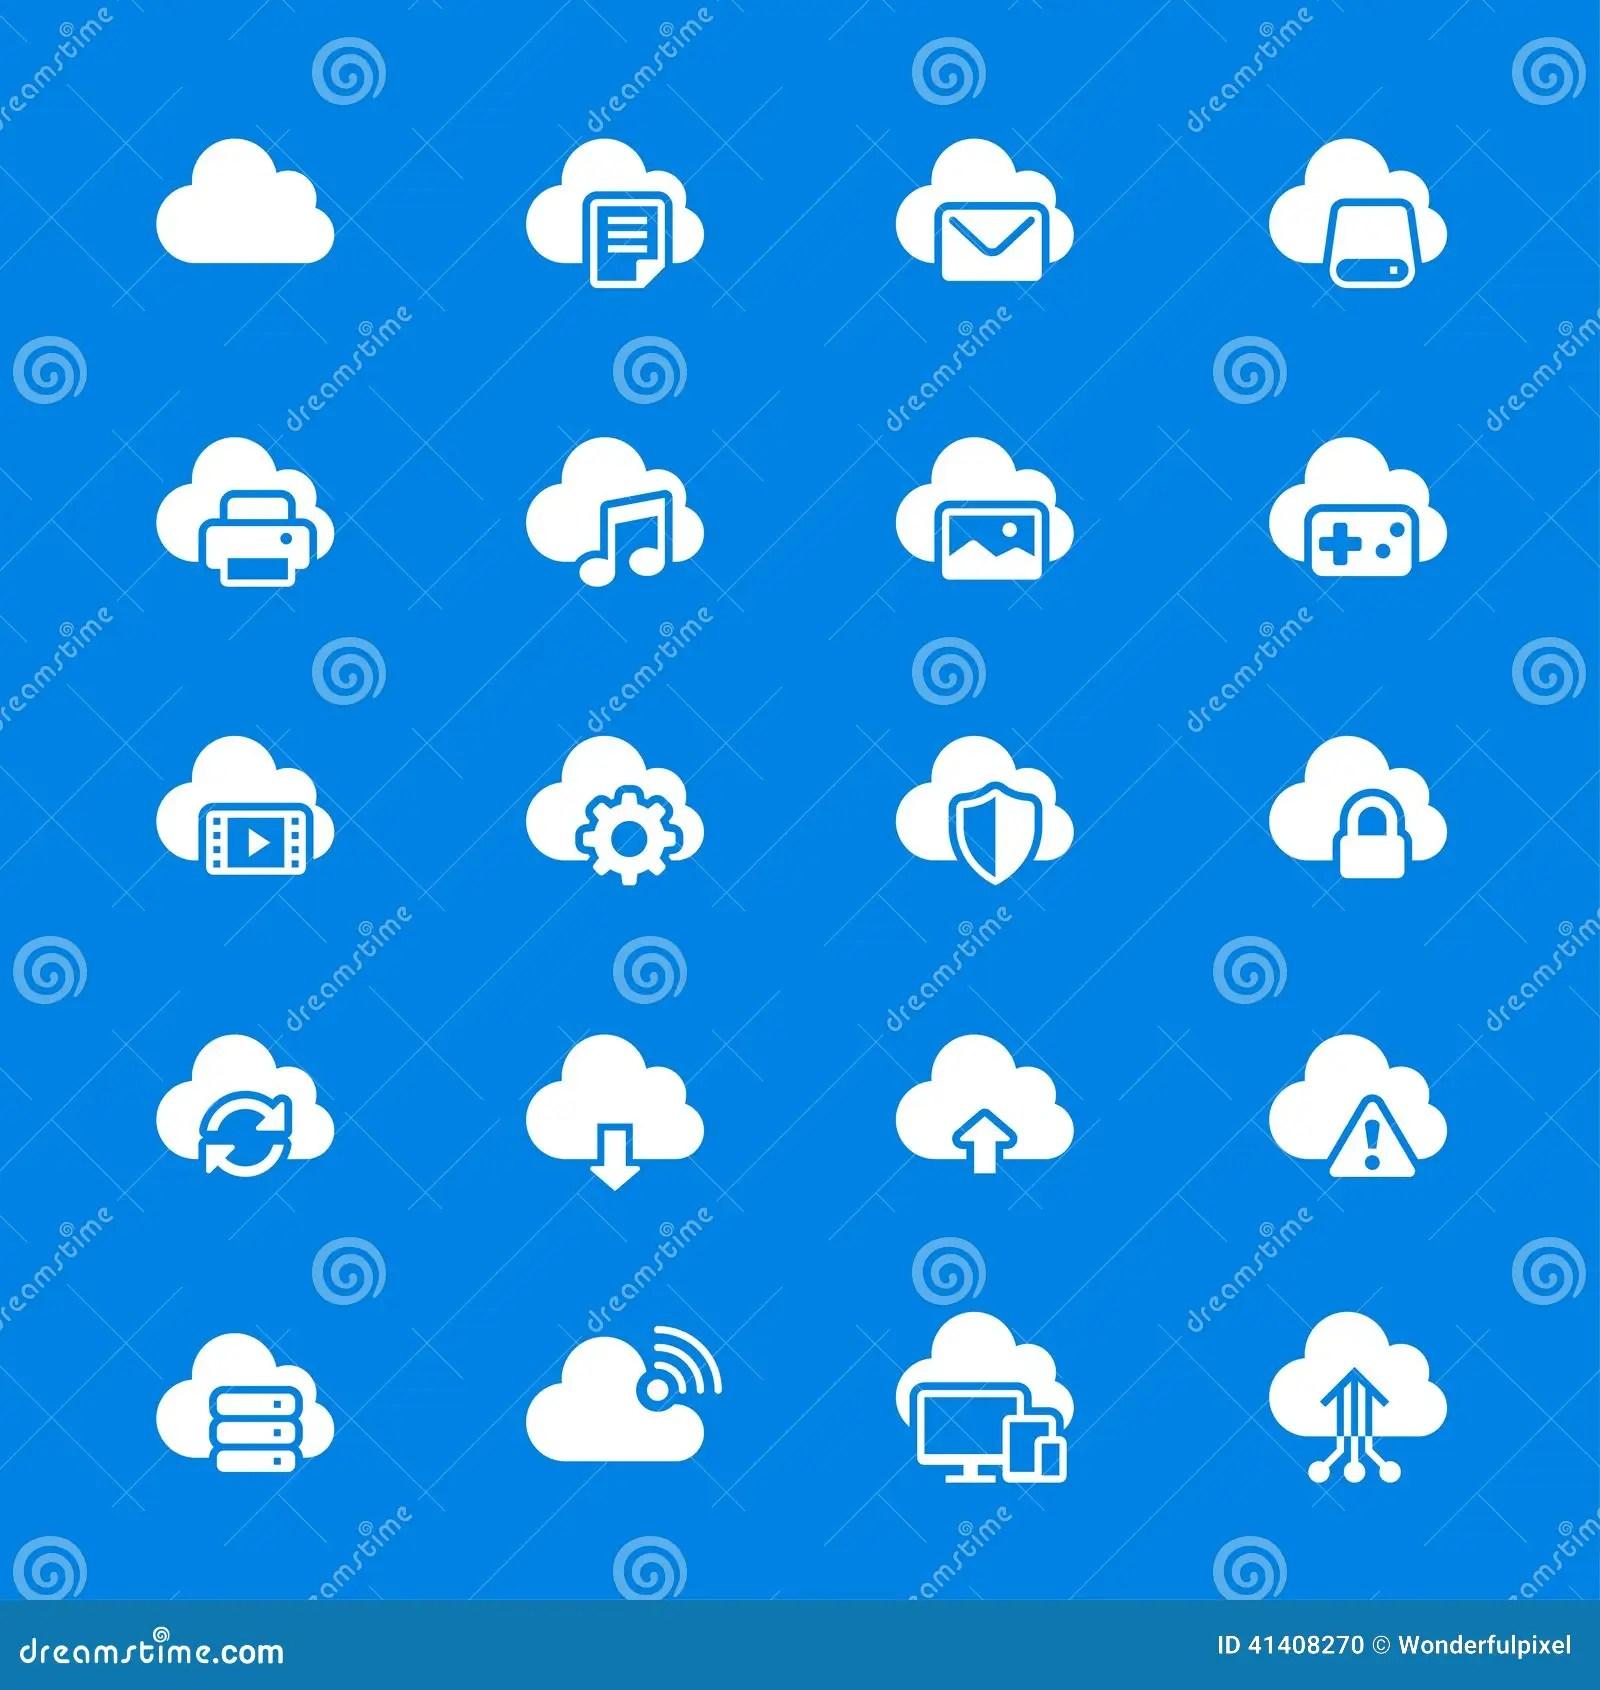 Cloud Computing Flat Icons Stock Vector